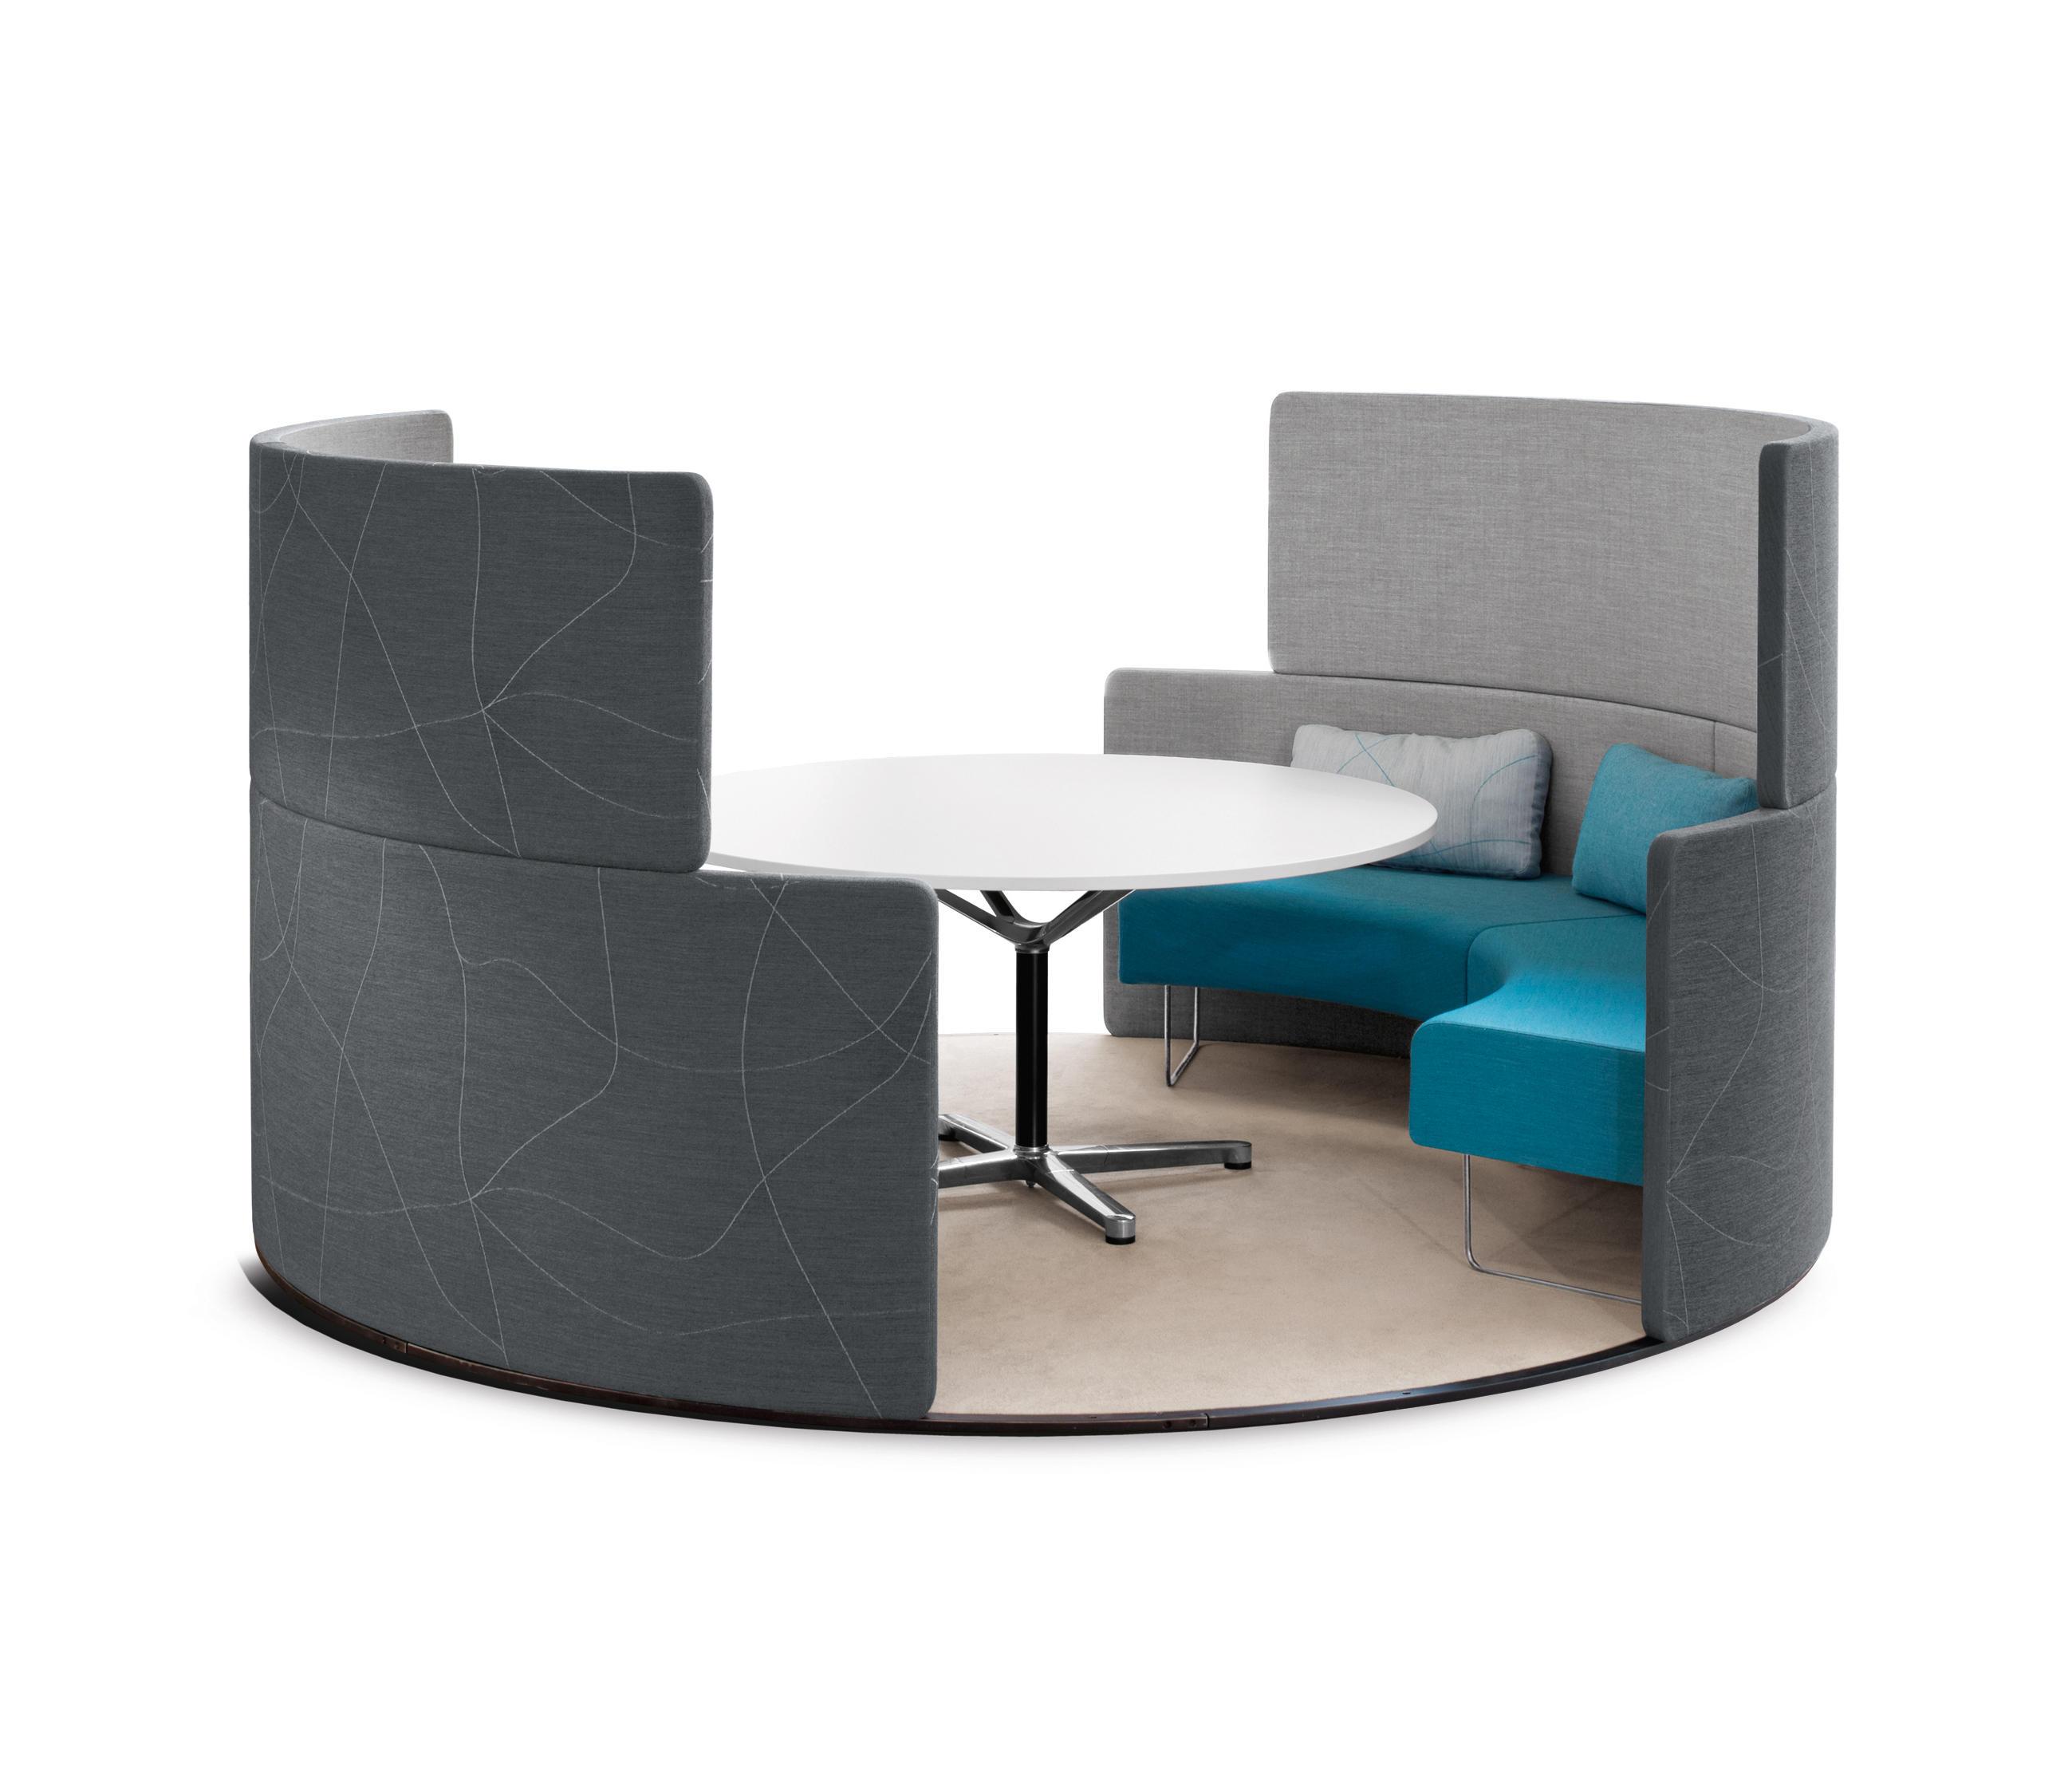 Bene Office Furniture: PARCS TOGUNA CIRCLE - Office Pods From Bene